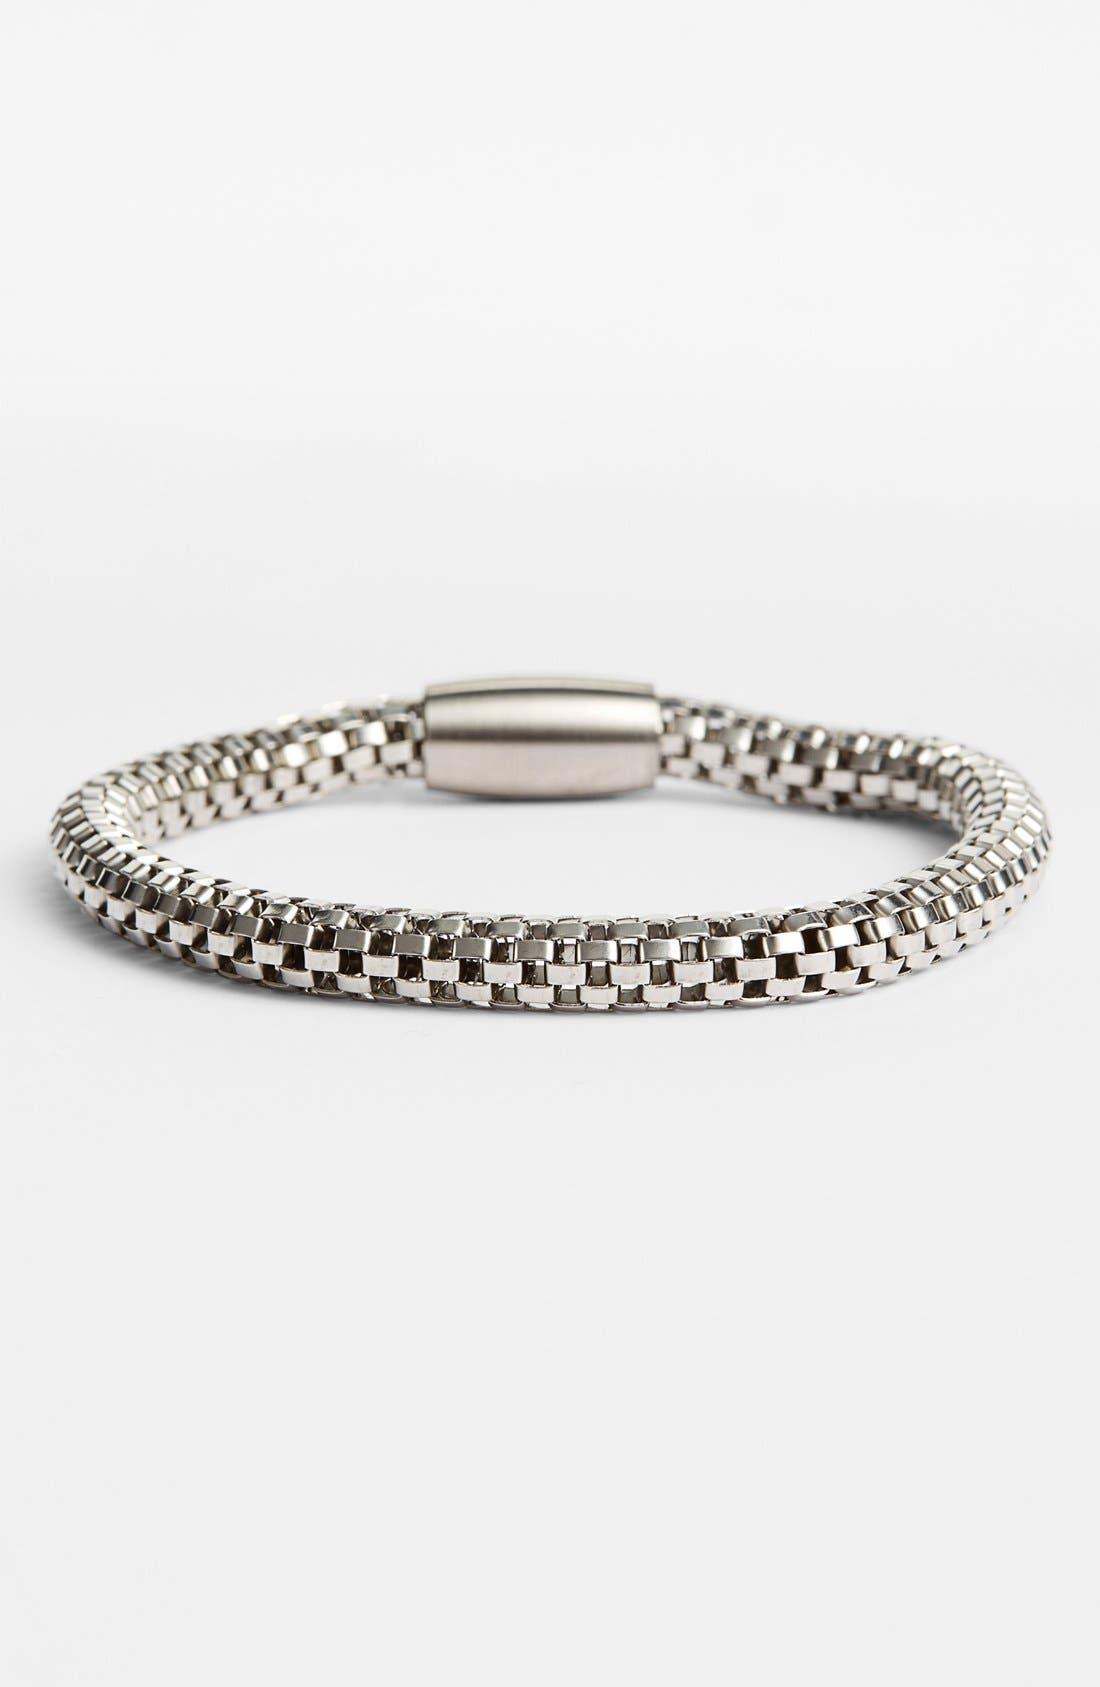 LINK UP Woven Chain Bracelet